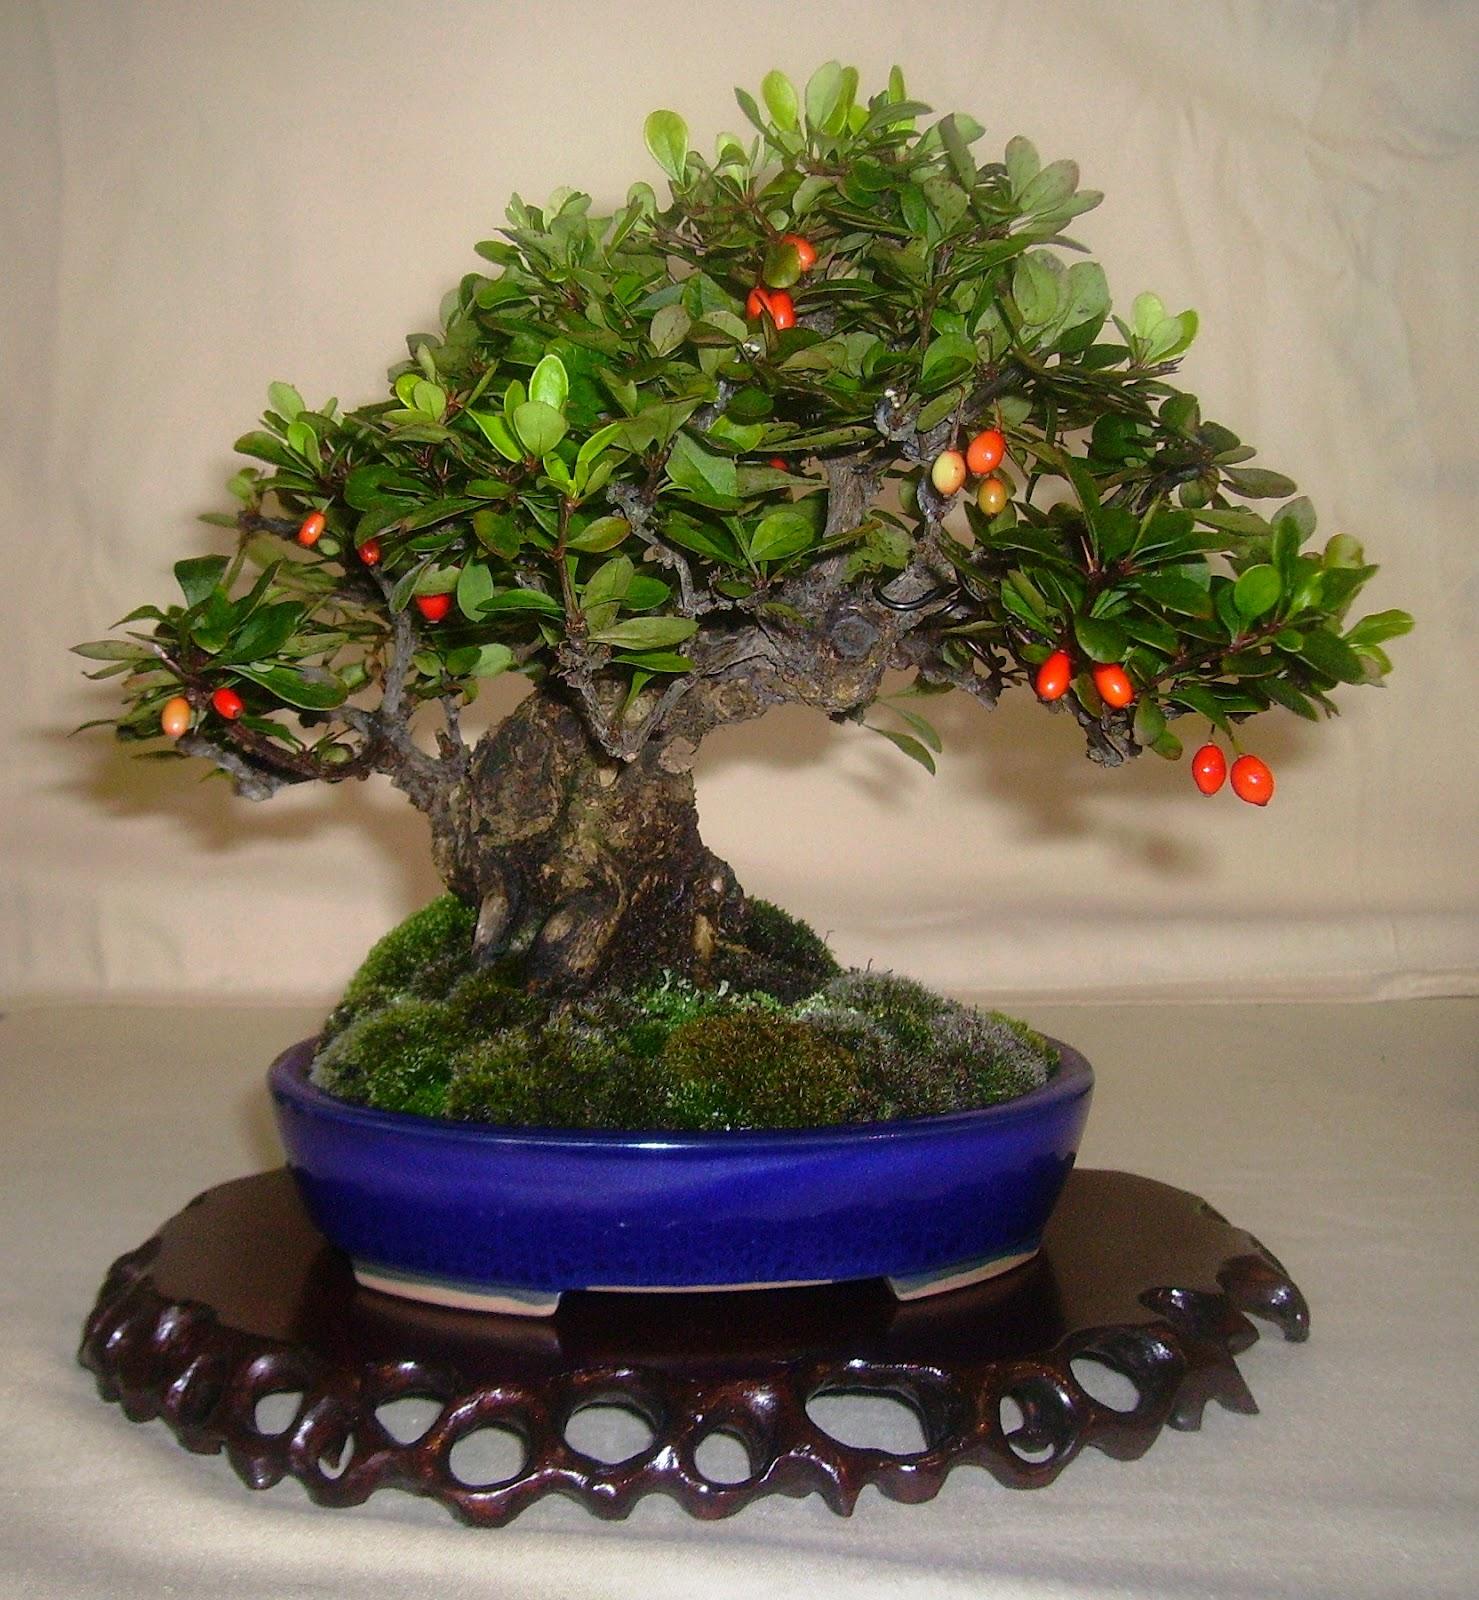 Bespoke Bonsai Stands British Shohin Association Display At The